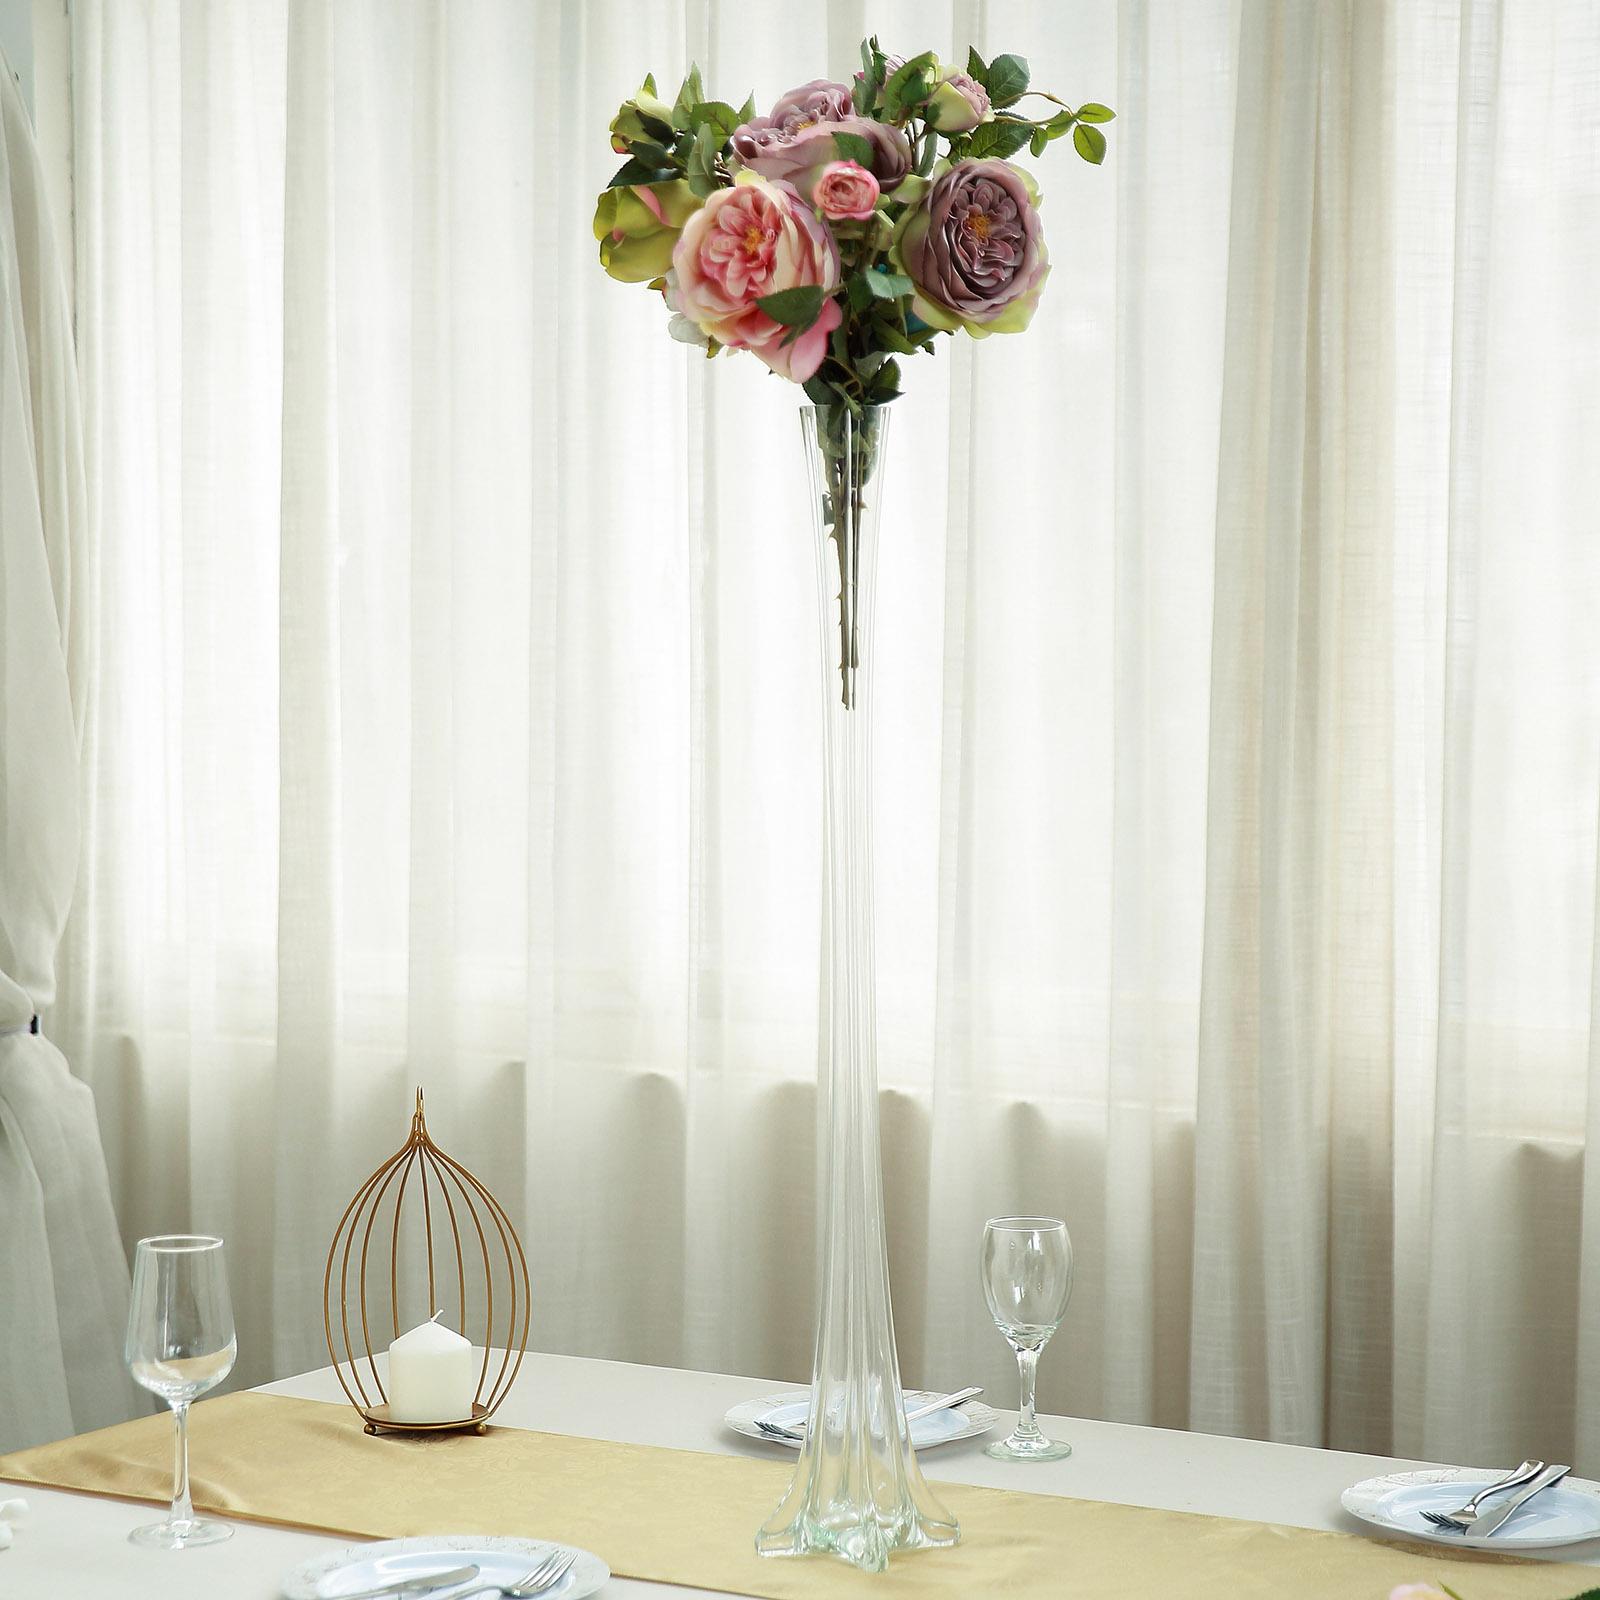 6 Clear 32 Tall Wedding Centerpiece Eiffel Tower Vase Reception